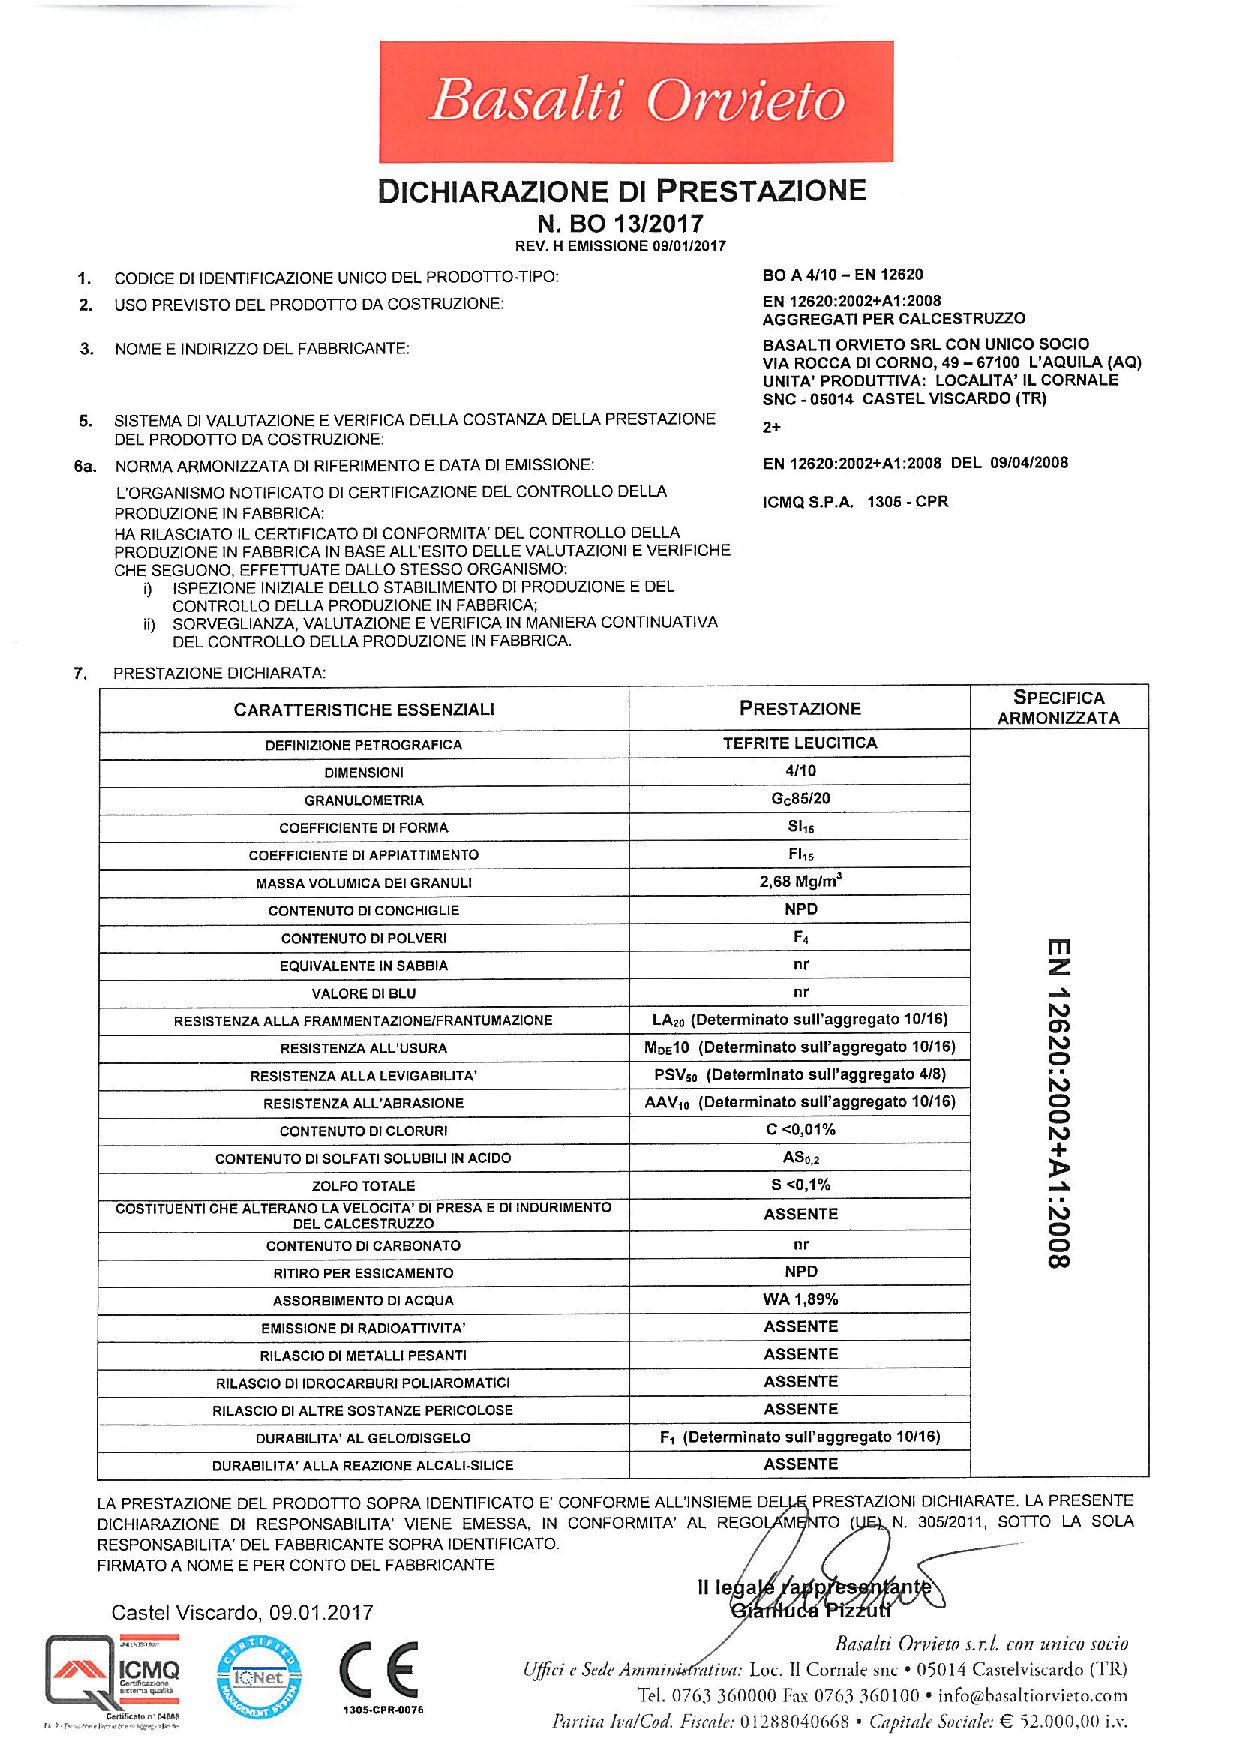 Calcestruzzo_DoP 4-10 - EN 12620